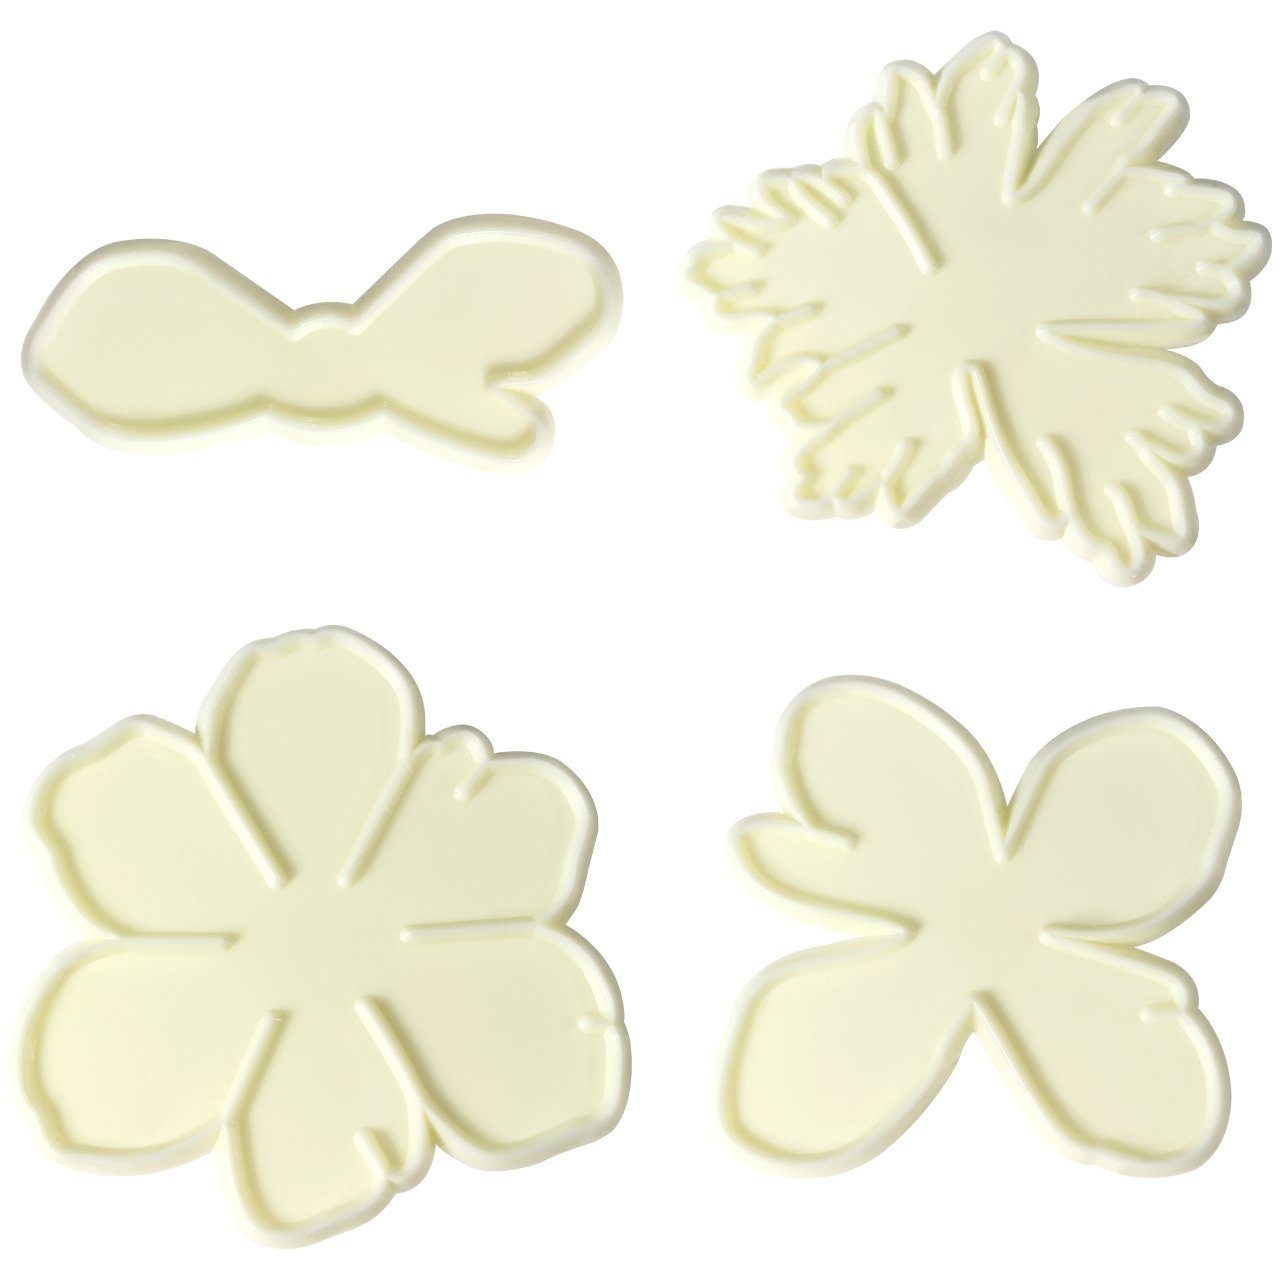 JEM Anemone Cutter, Set of 4, Yellow